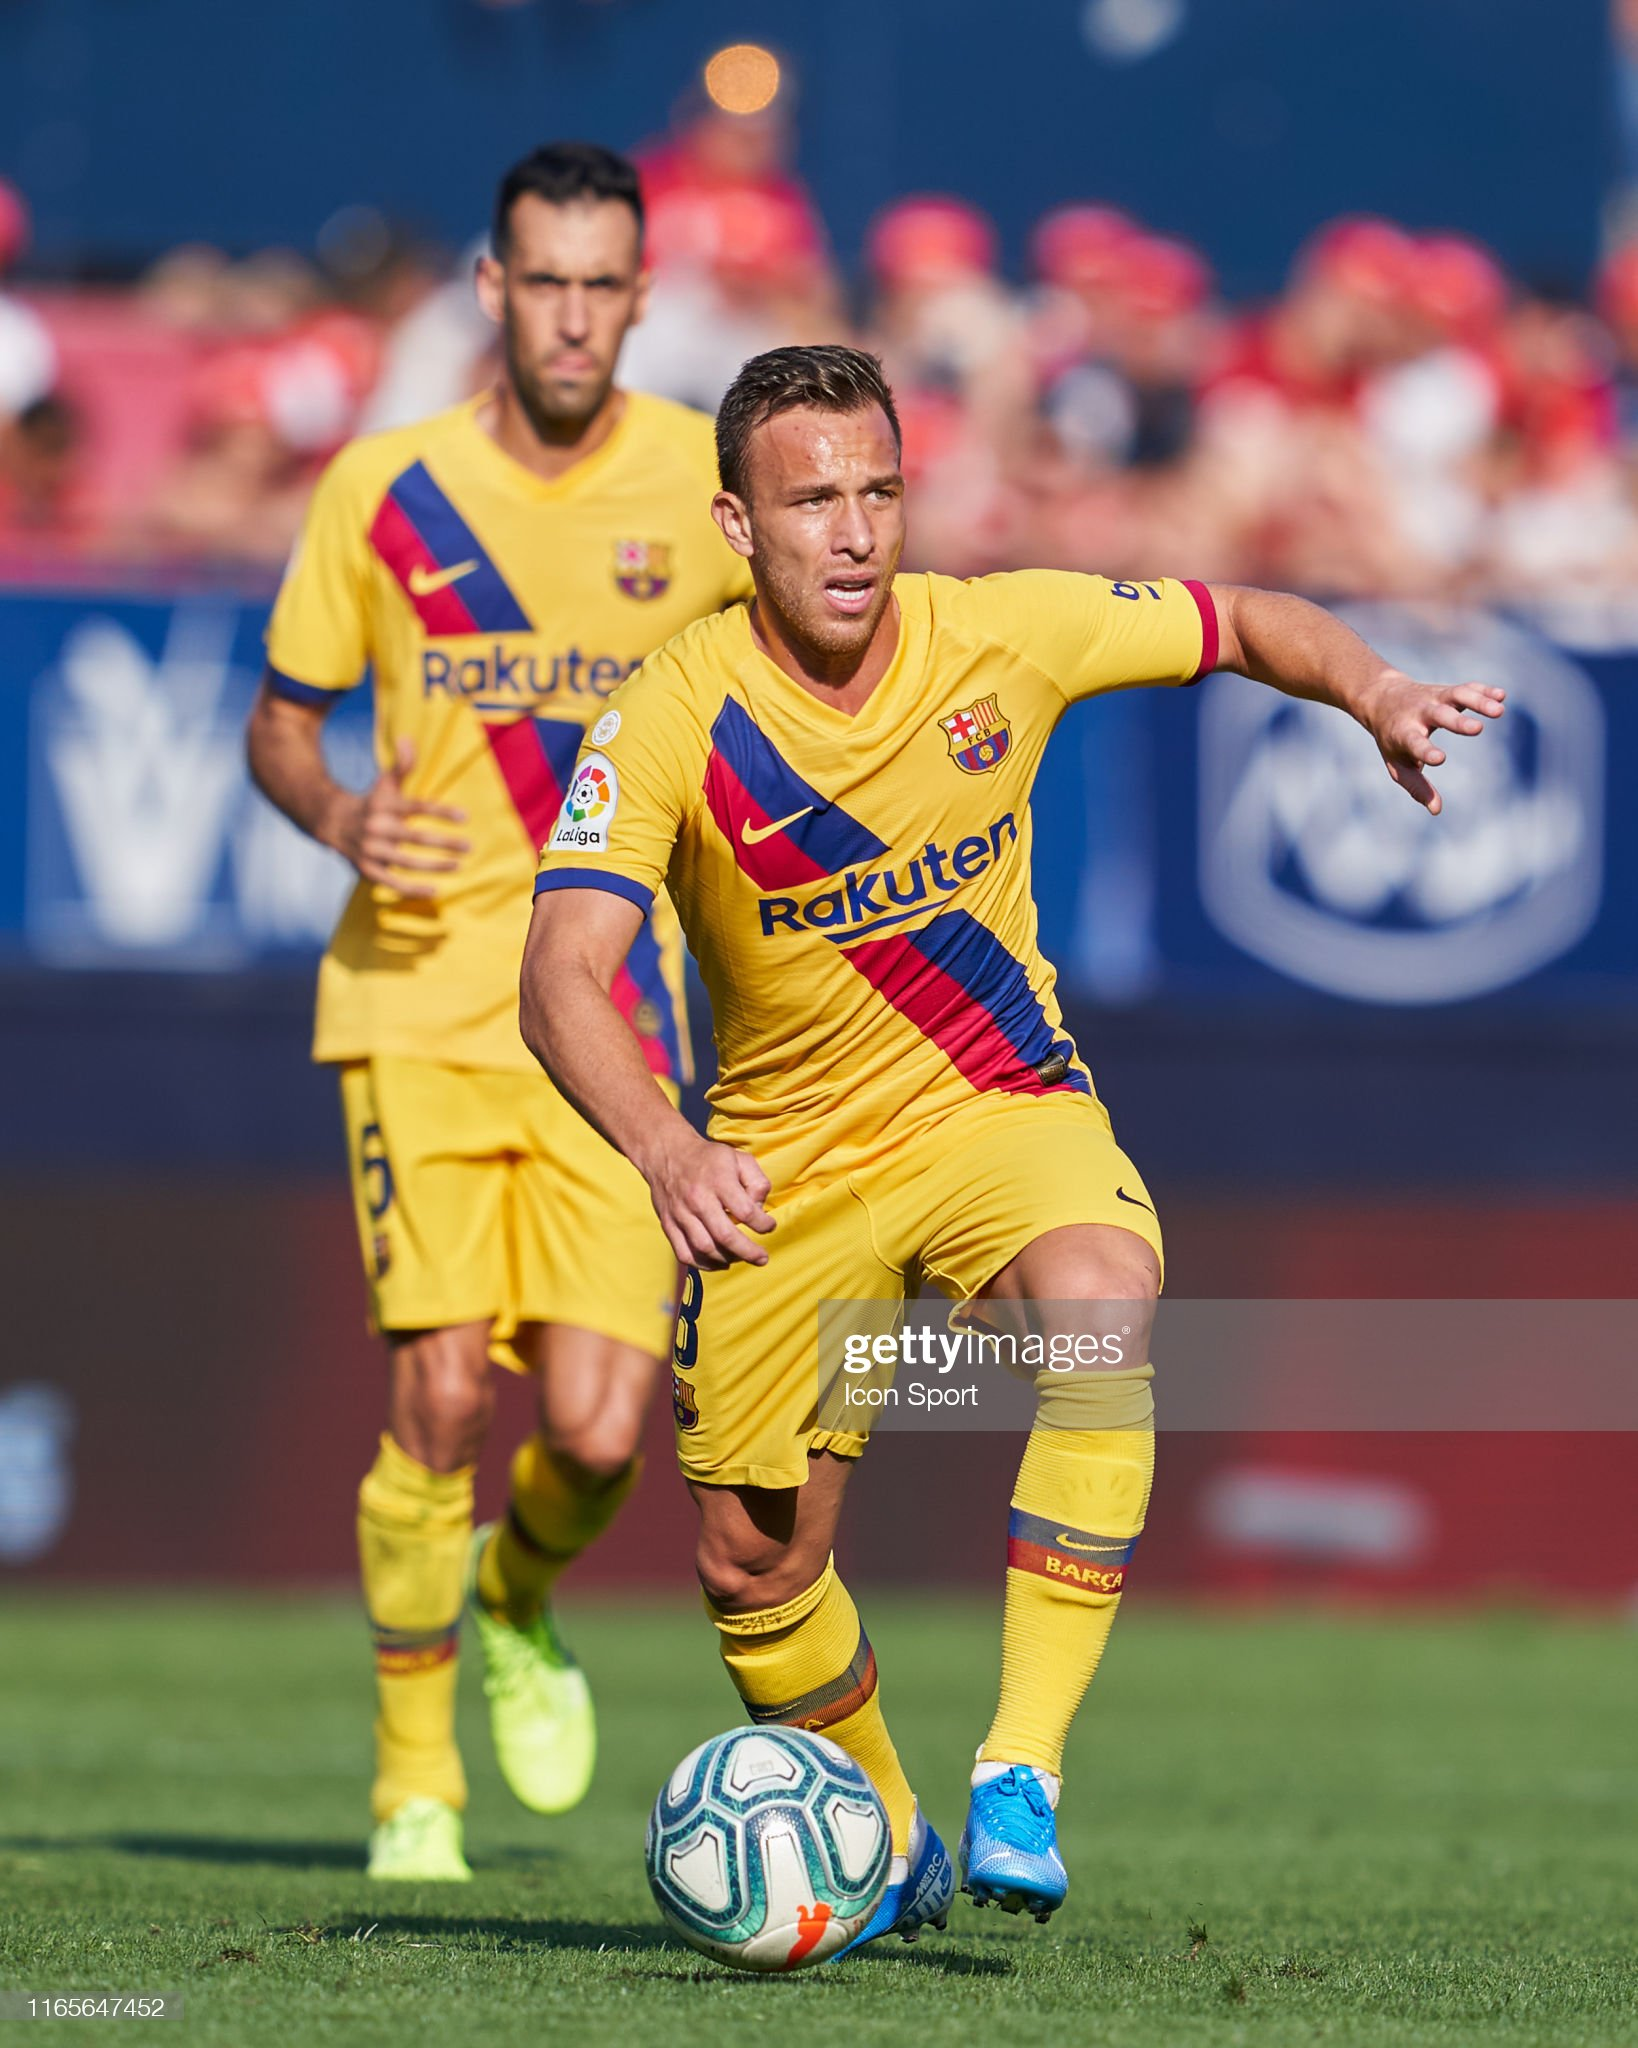 صور مباراة : أوساسونا - برشلونة 2-2 ( 31-08-2019 )  Arthur-henrique-melo-of-fc-barcelona-during-the-liga-match-between-picture-id1165647452?s=2048x2048